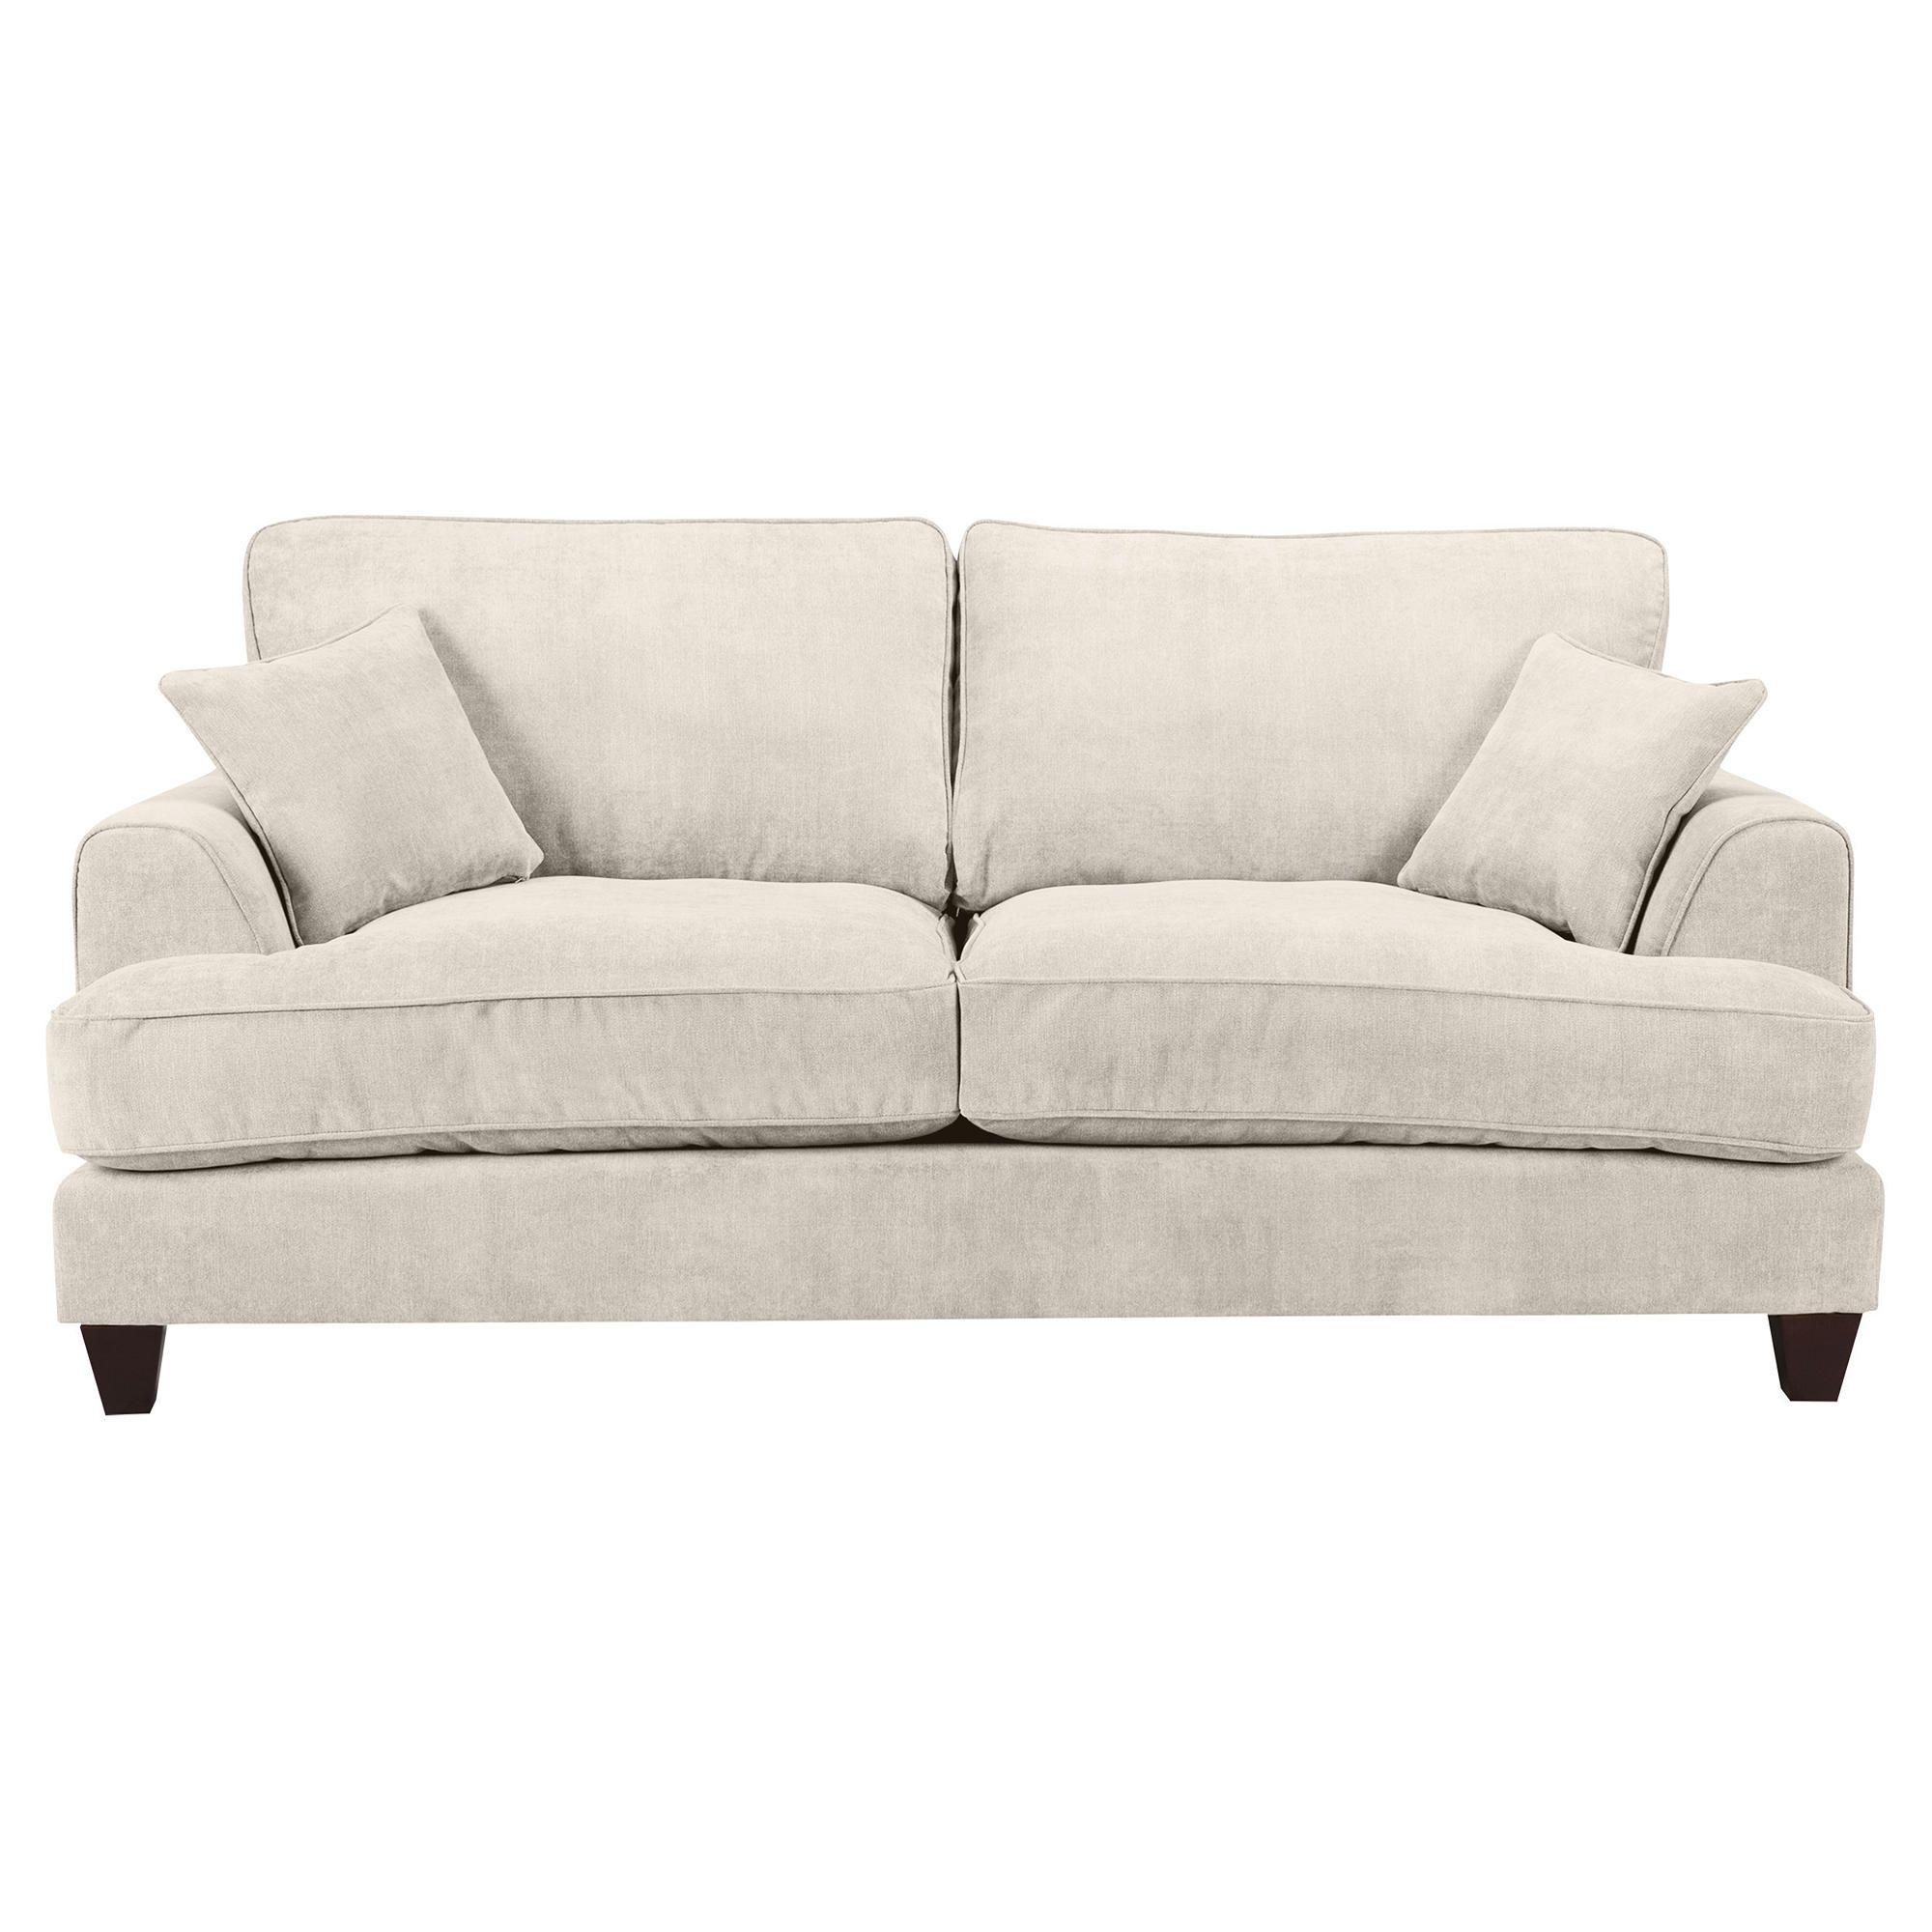 Kensington Fabric Large Sofa Biscuit at Tesco Direct